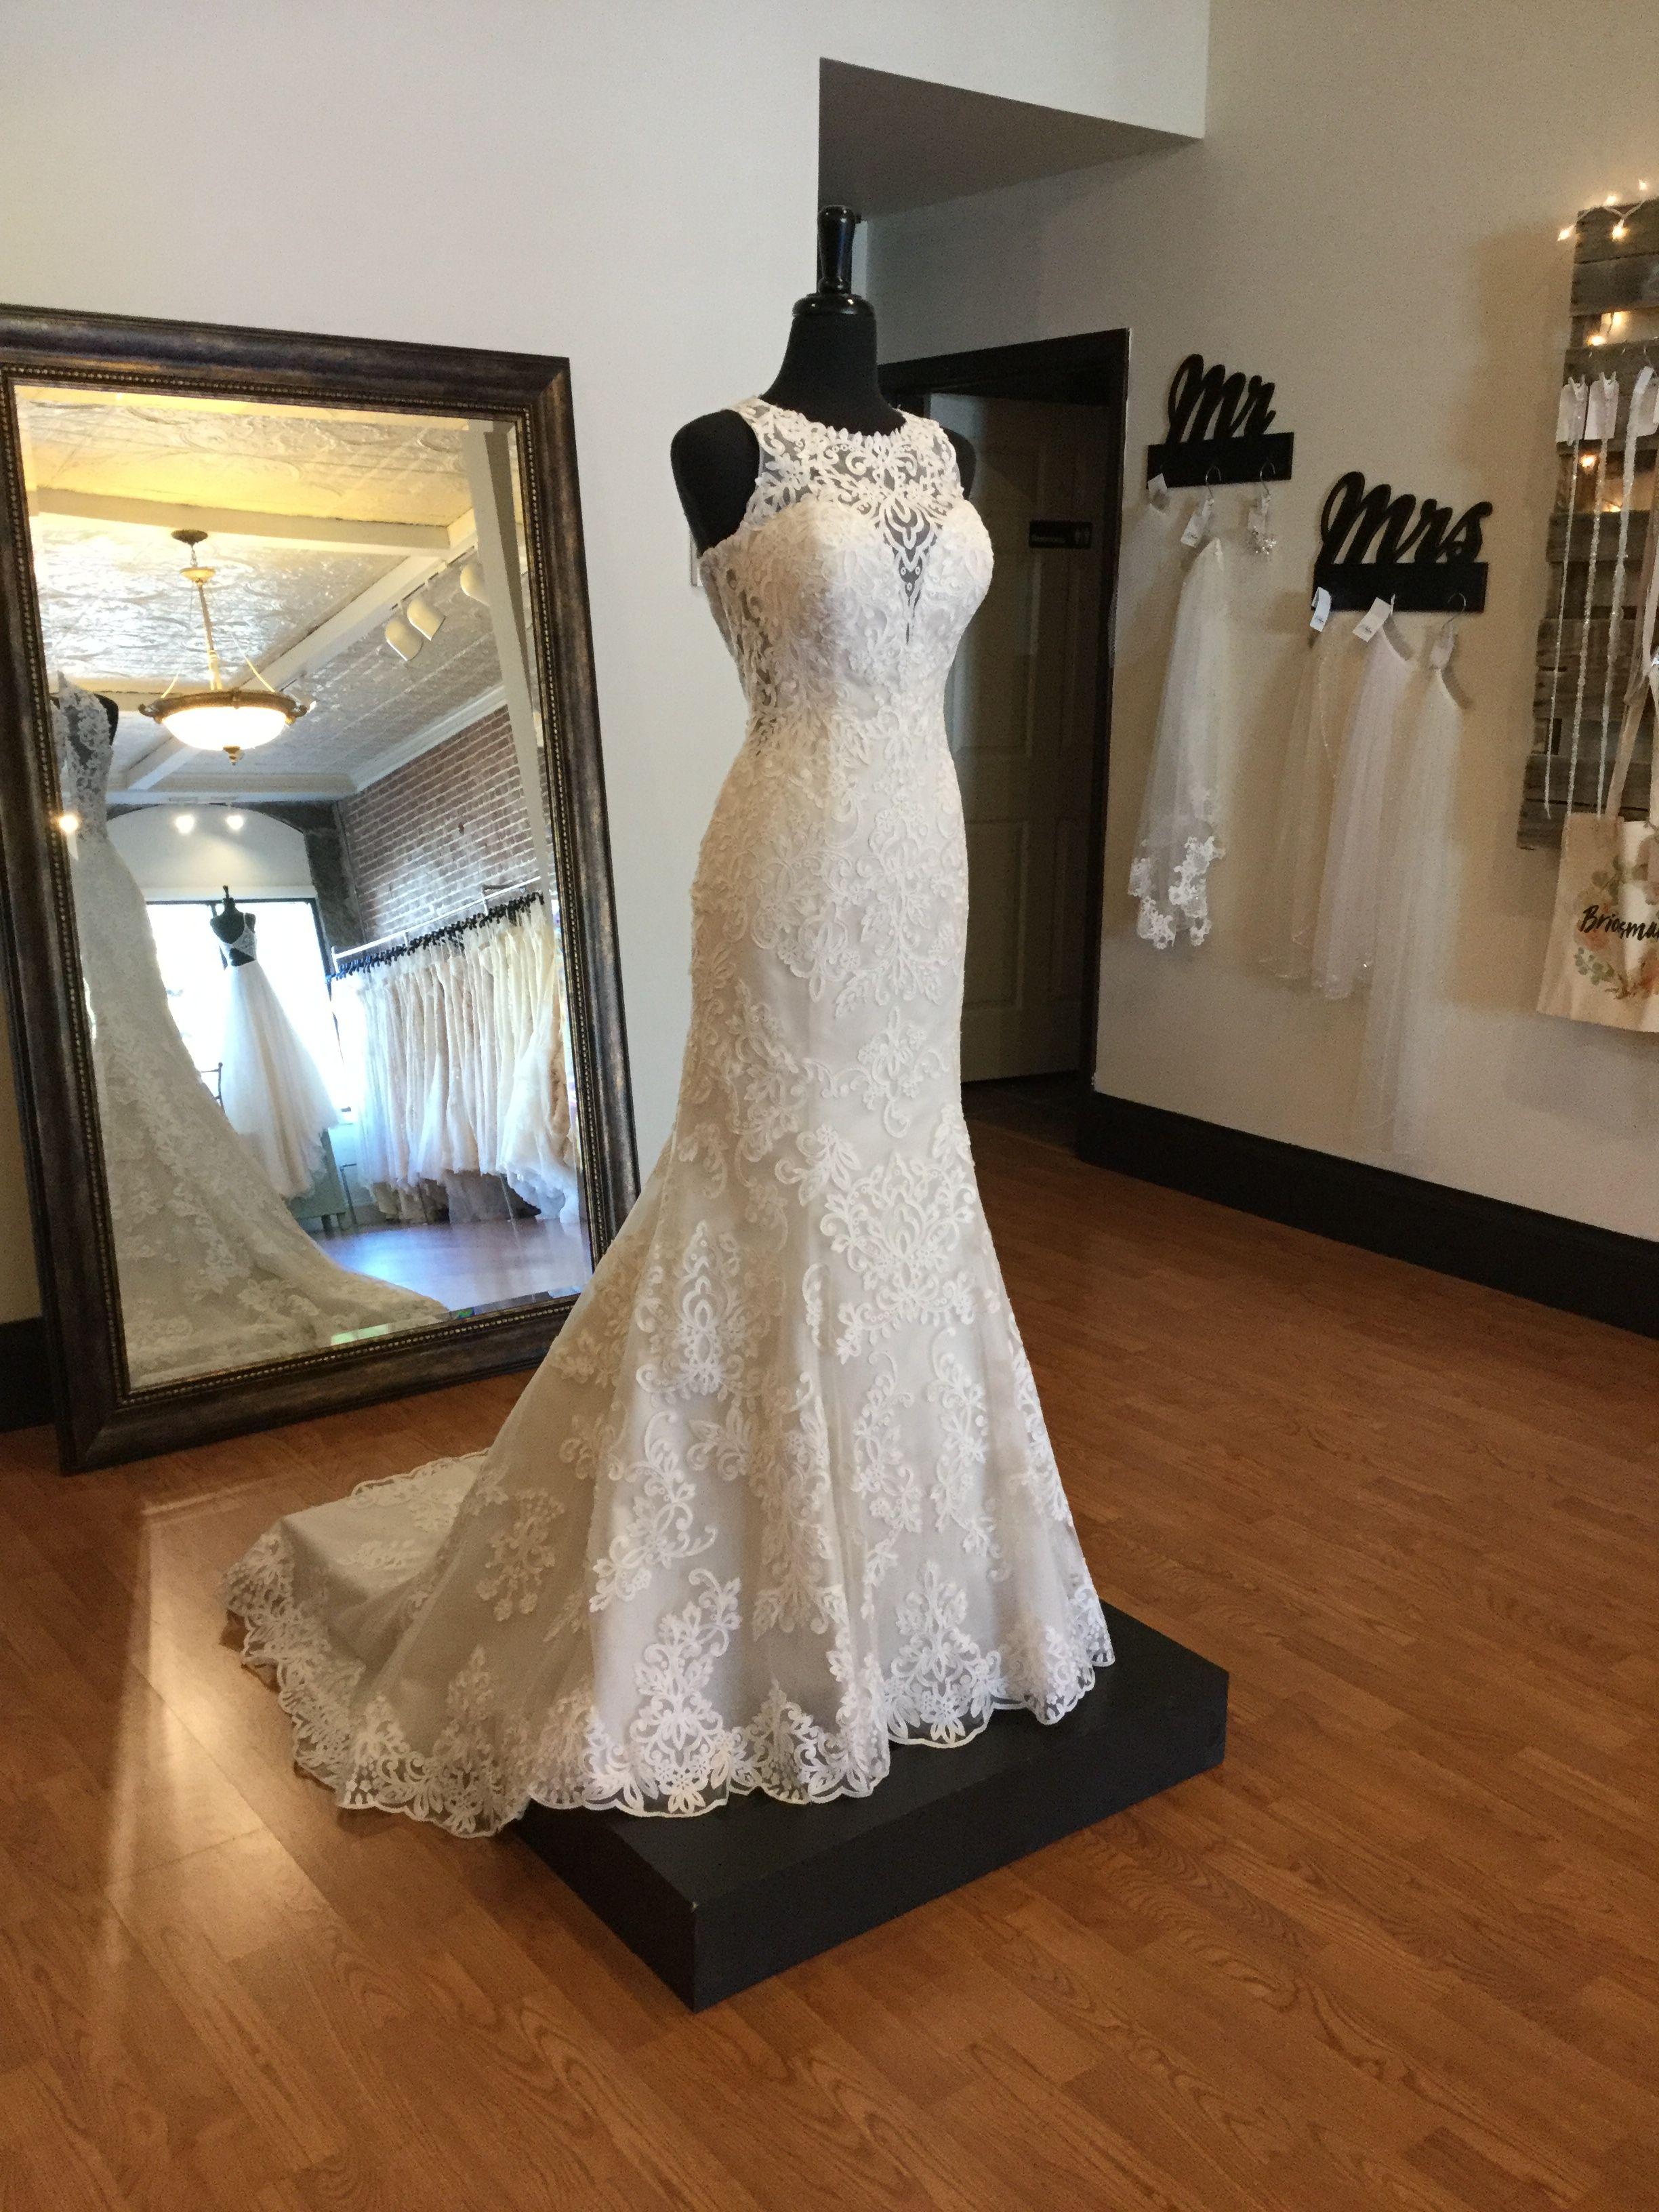 Feminine sheer lace wedding dress ontrend high neckline